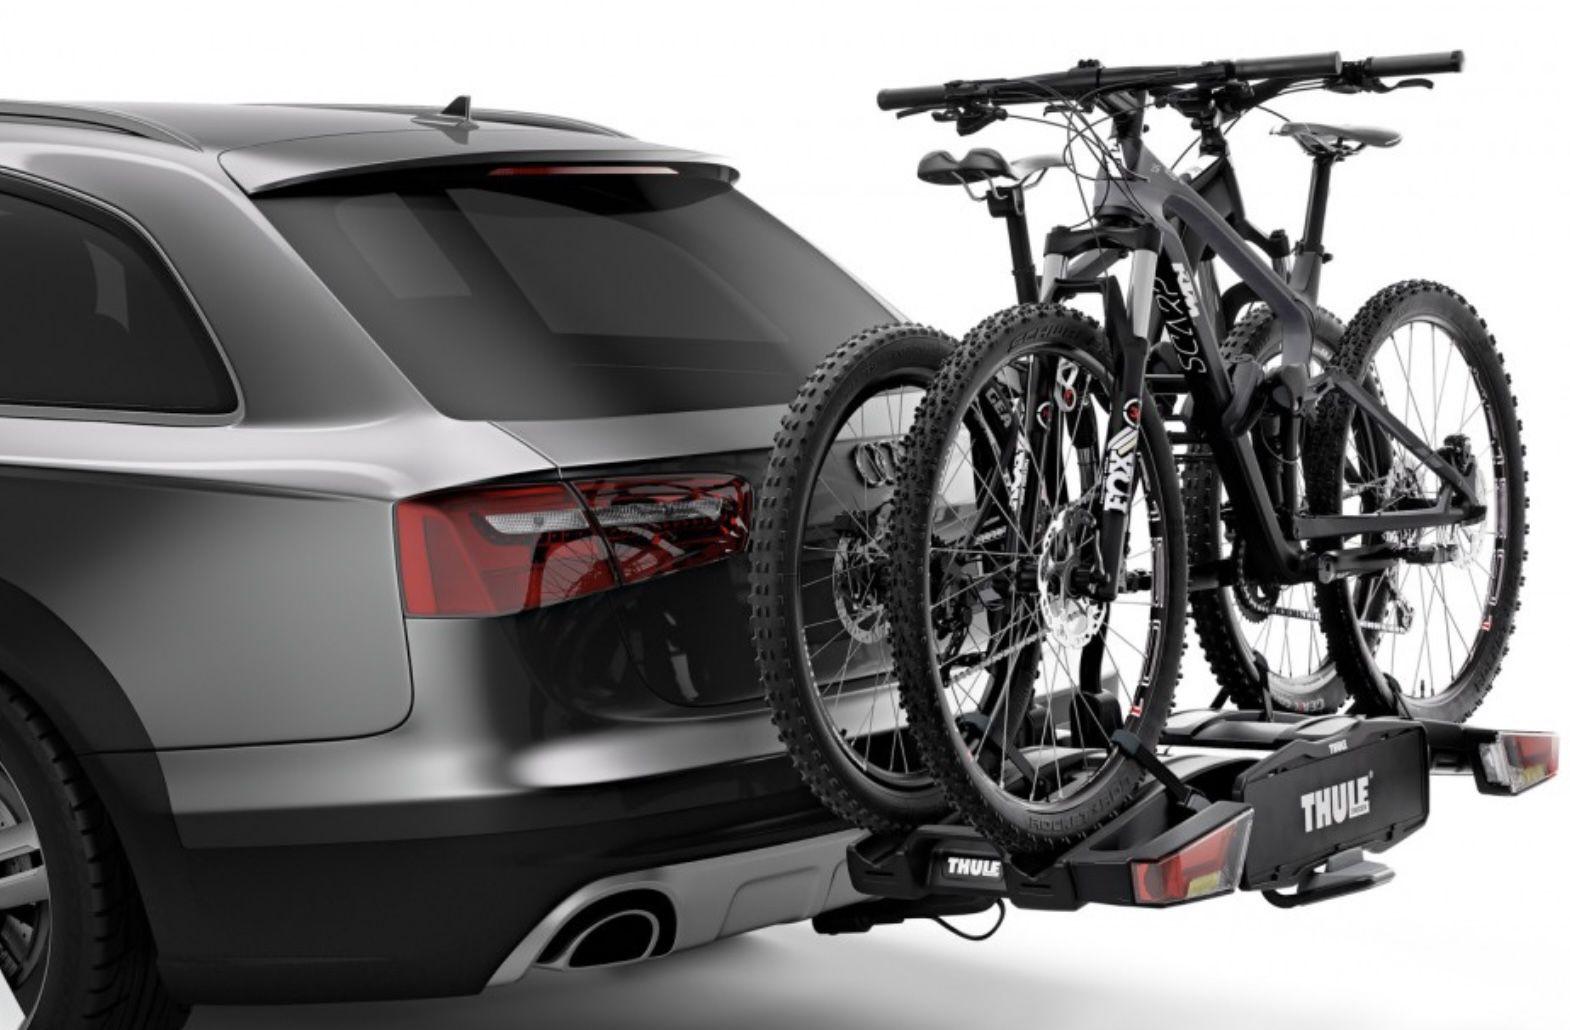 THULE  EasyFold XT 2 Fahrradträger faltbar inkl. Tasche für 615€ (statt 715€)